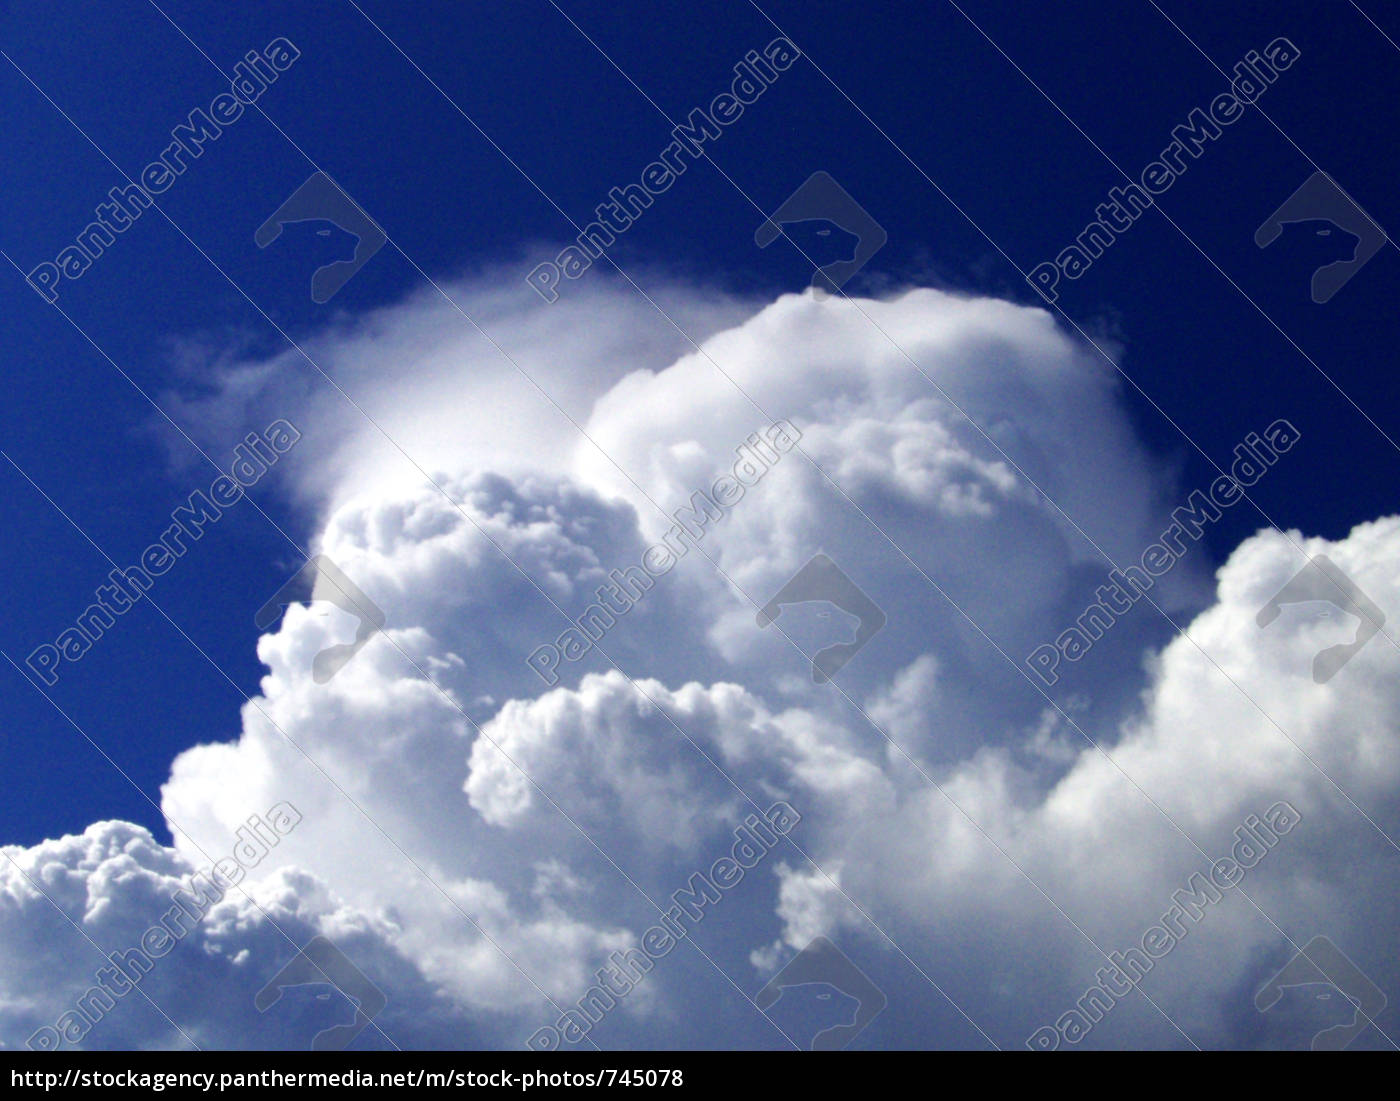 cloud, wall - 745078